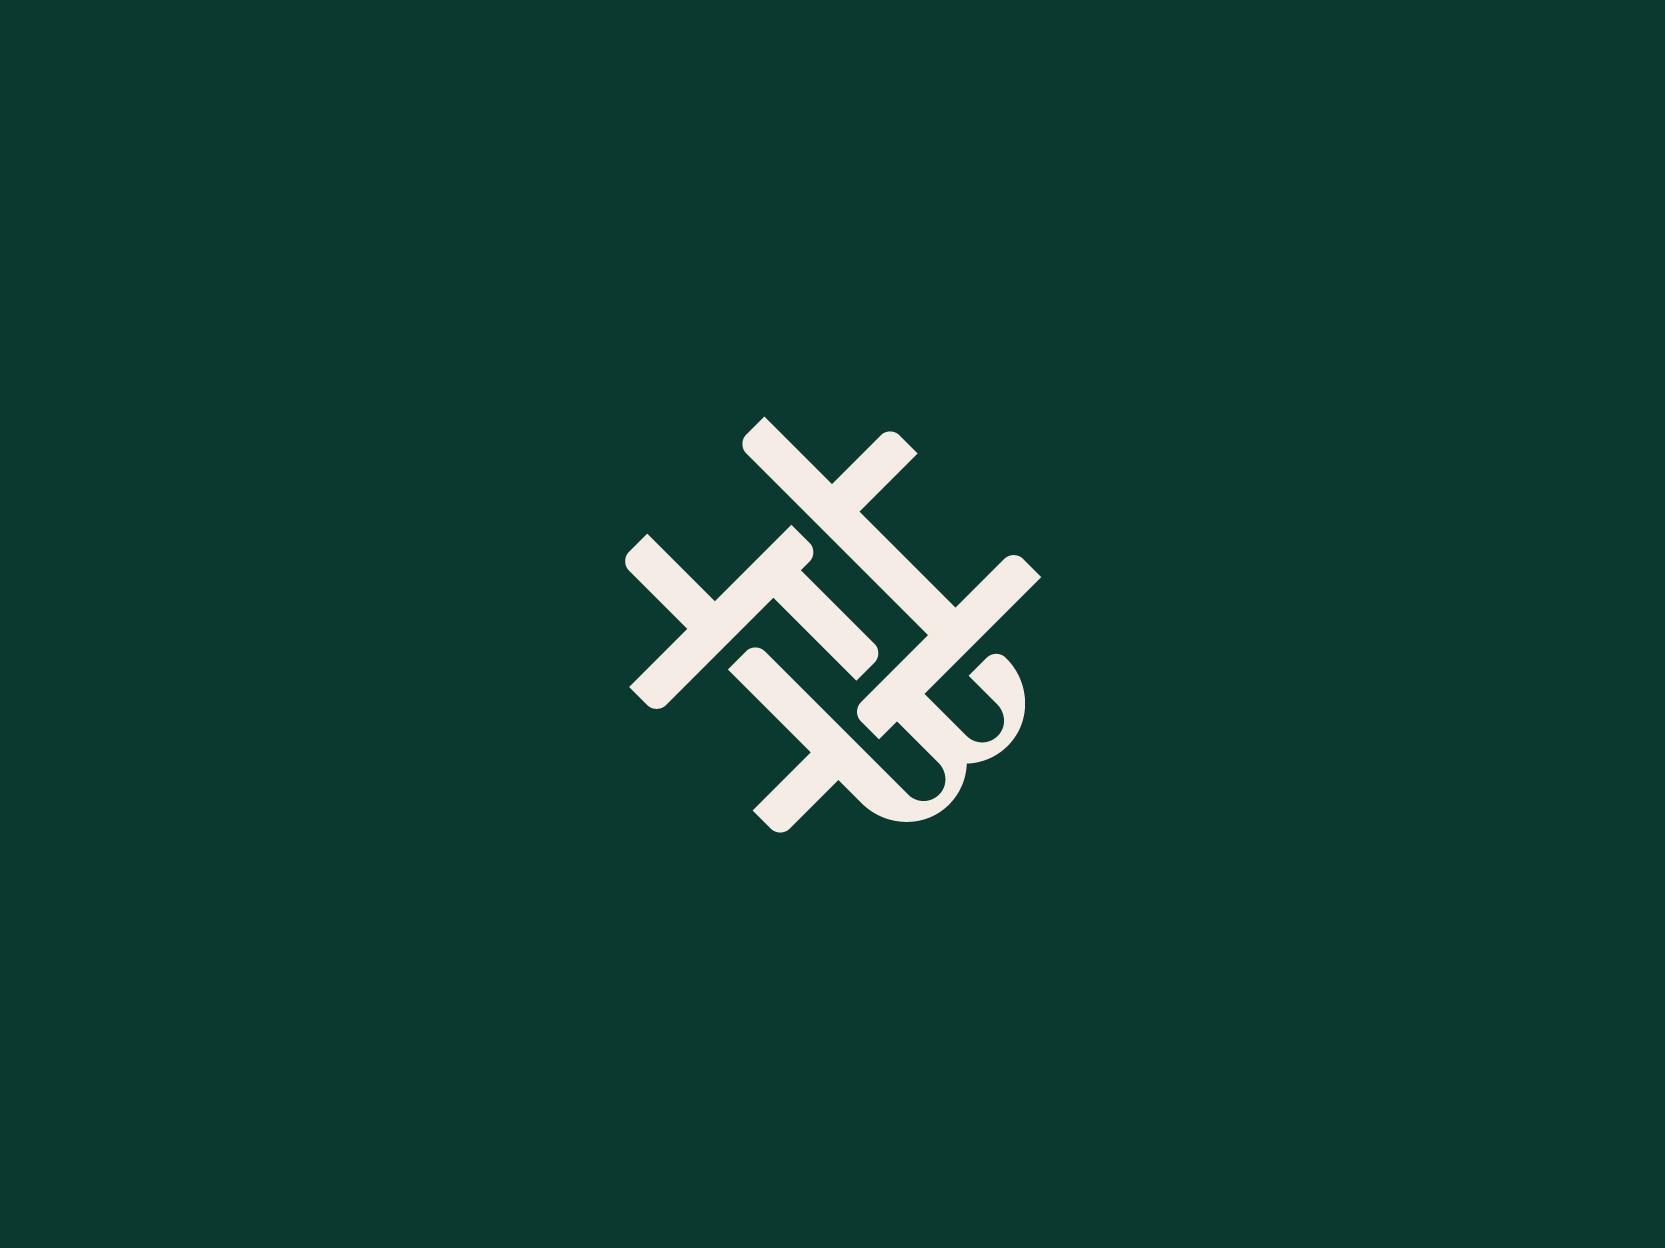 WH_Monogram-05